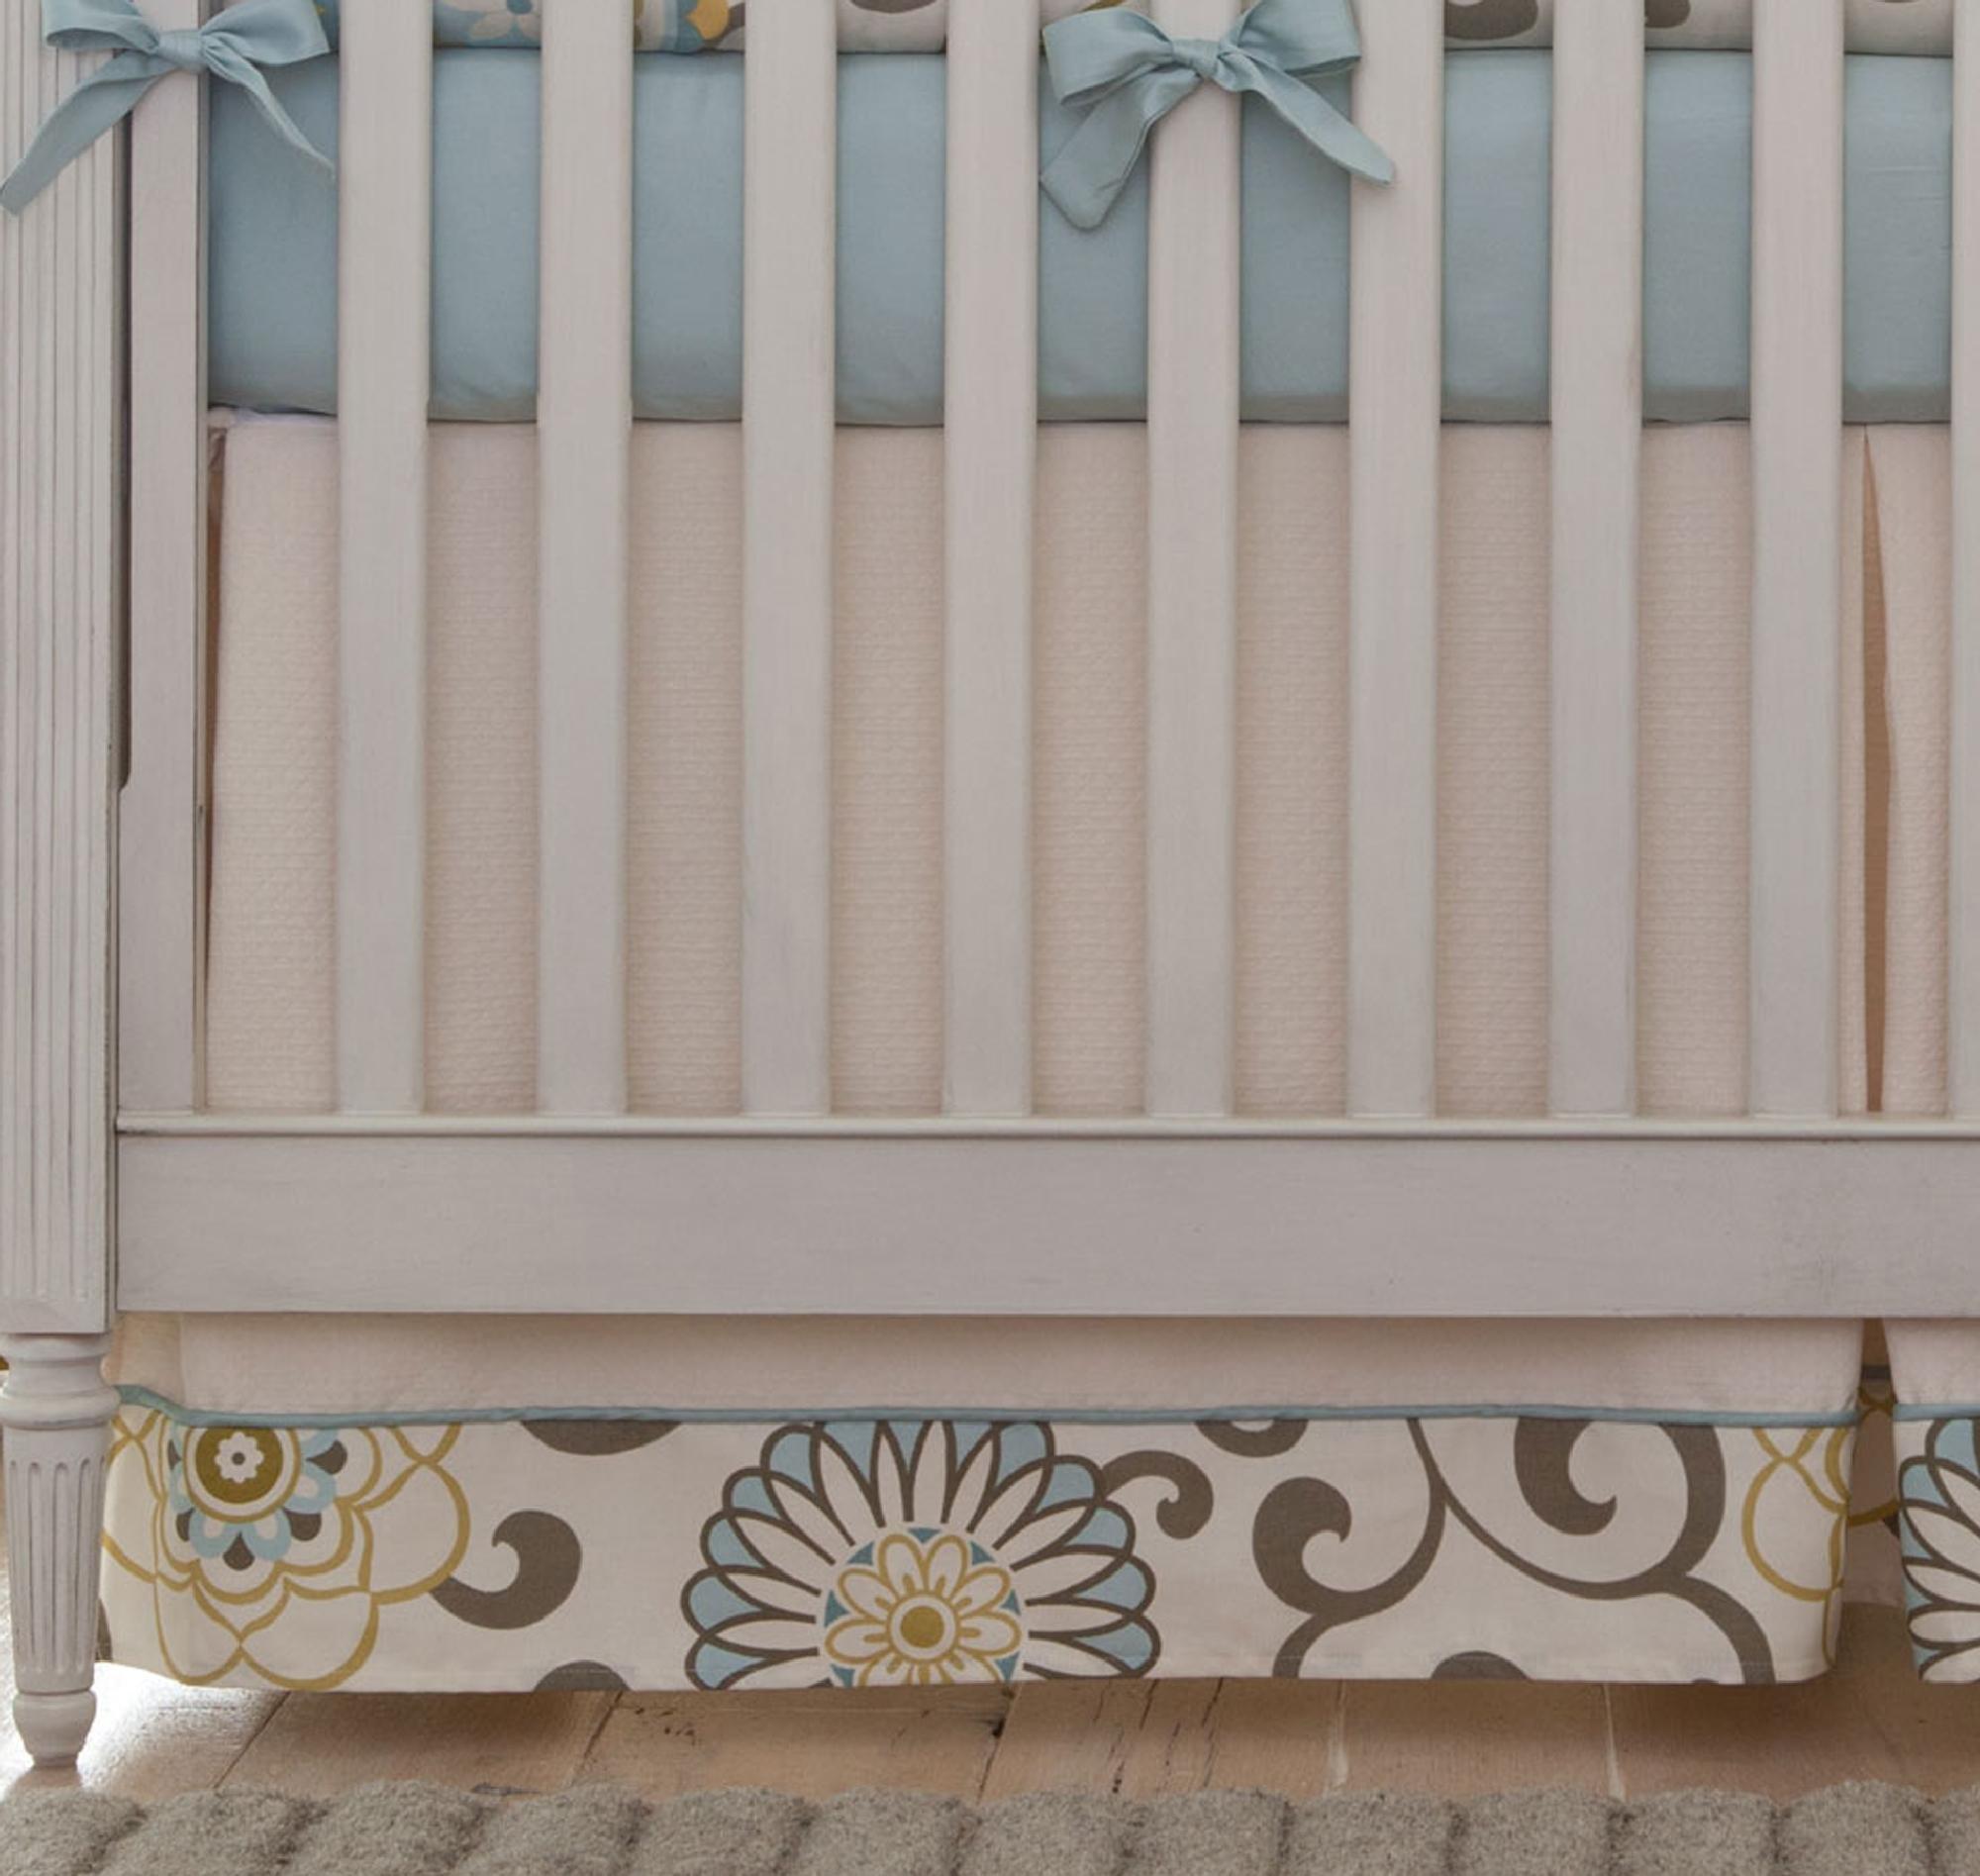 Carousel Designs Spa Pom Pon Play 2-Piece Crib Bedding Set